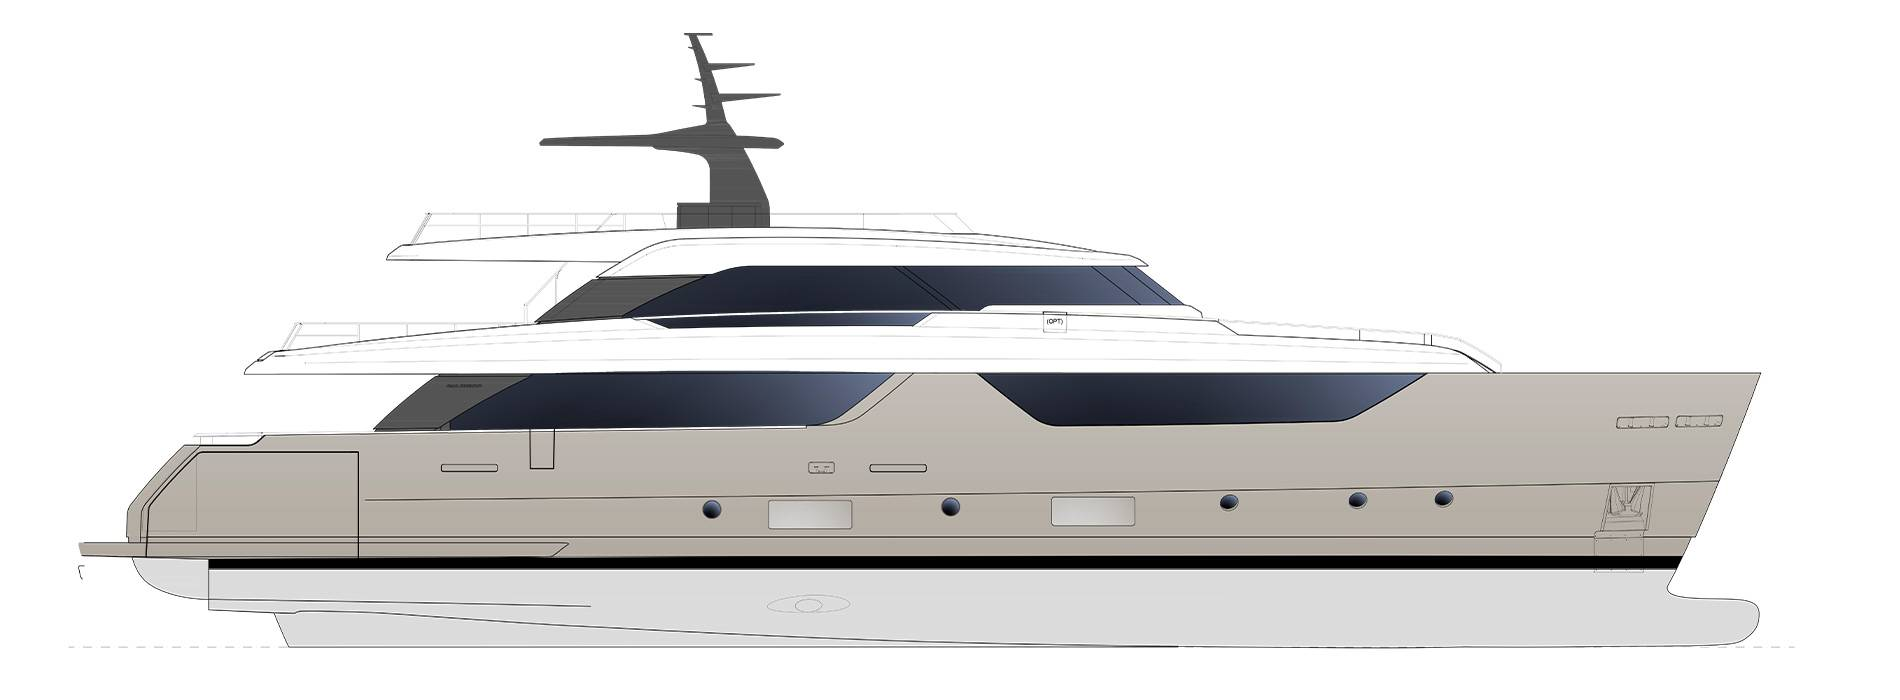 Sanlorenzo Yachts SD118 Profile